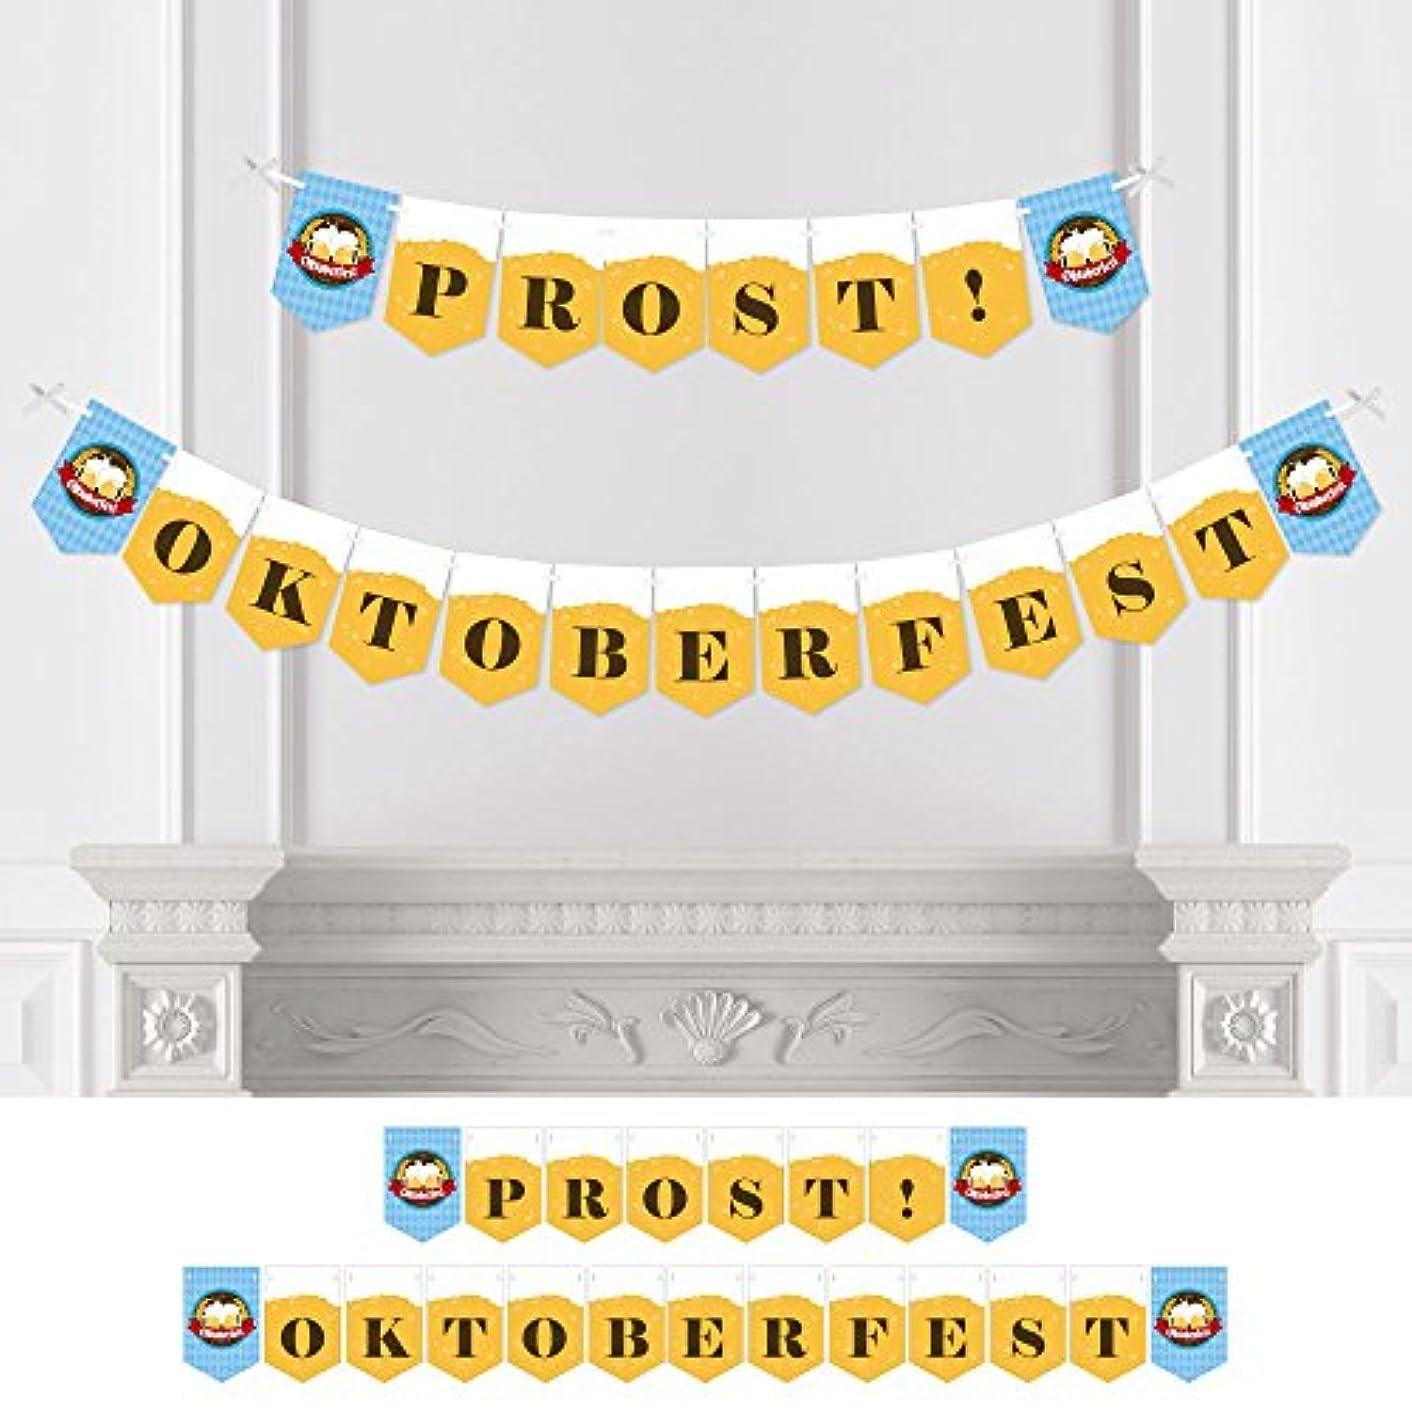 Big Dot of Happiness Oktoberfest - German Beer Festival Bunting Banner - Party Decorations - Prost! Oktoberfest